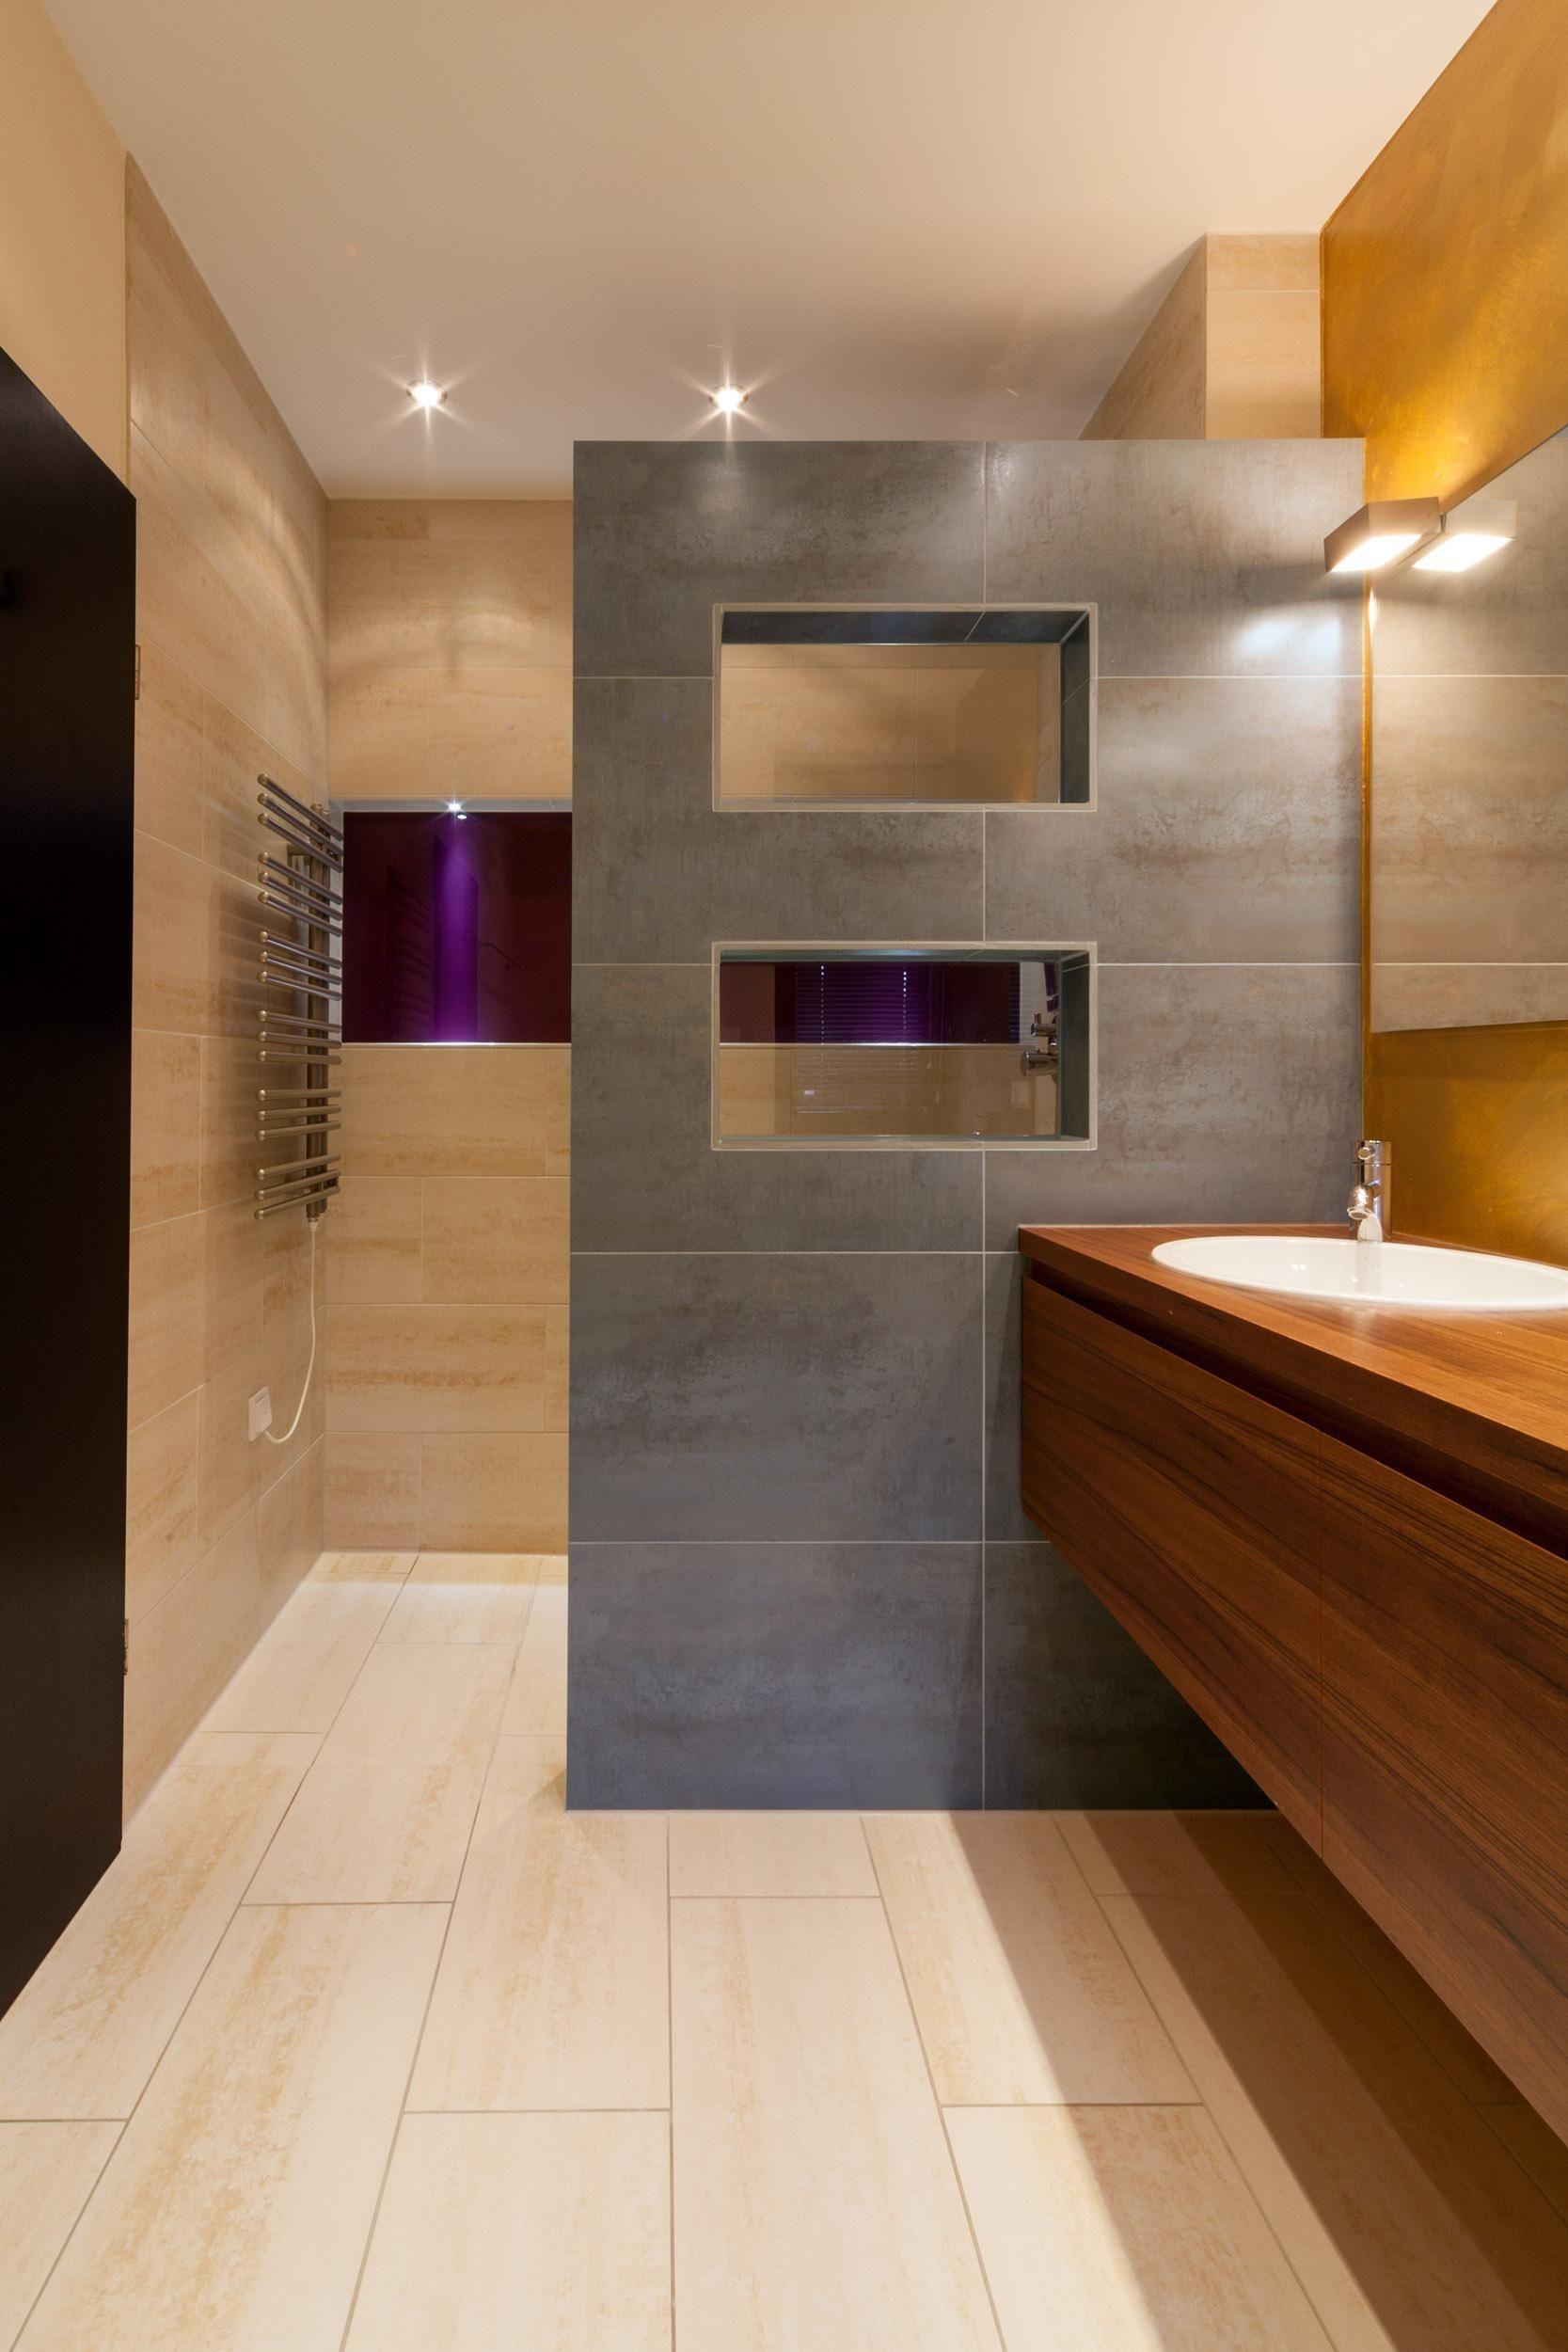 Anzeige- #bestebadstudios #badezimmer #bad #dusche | Idée ...